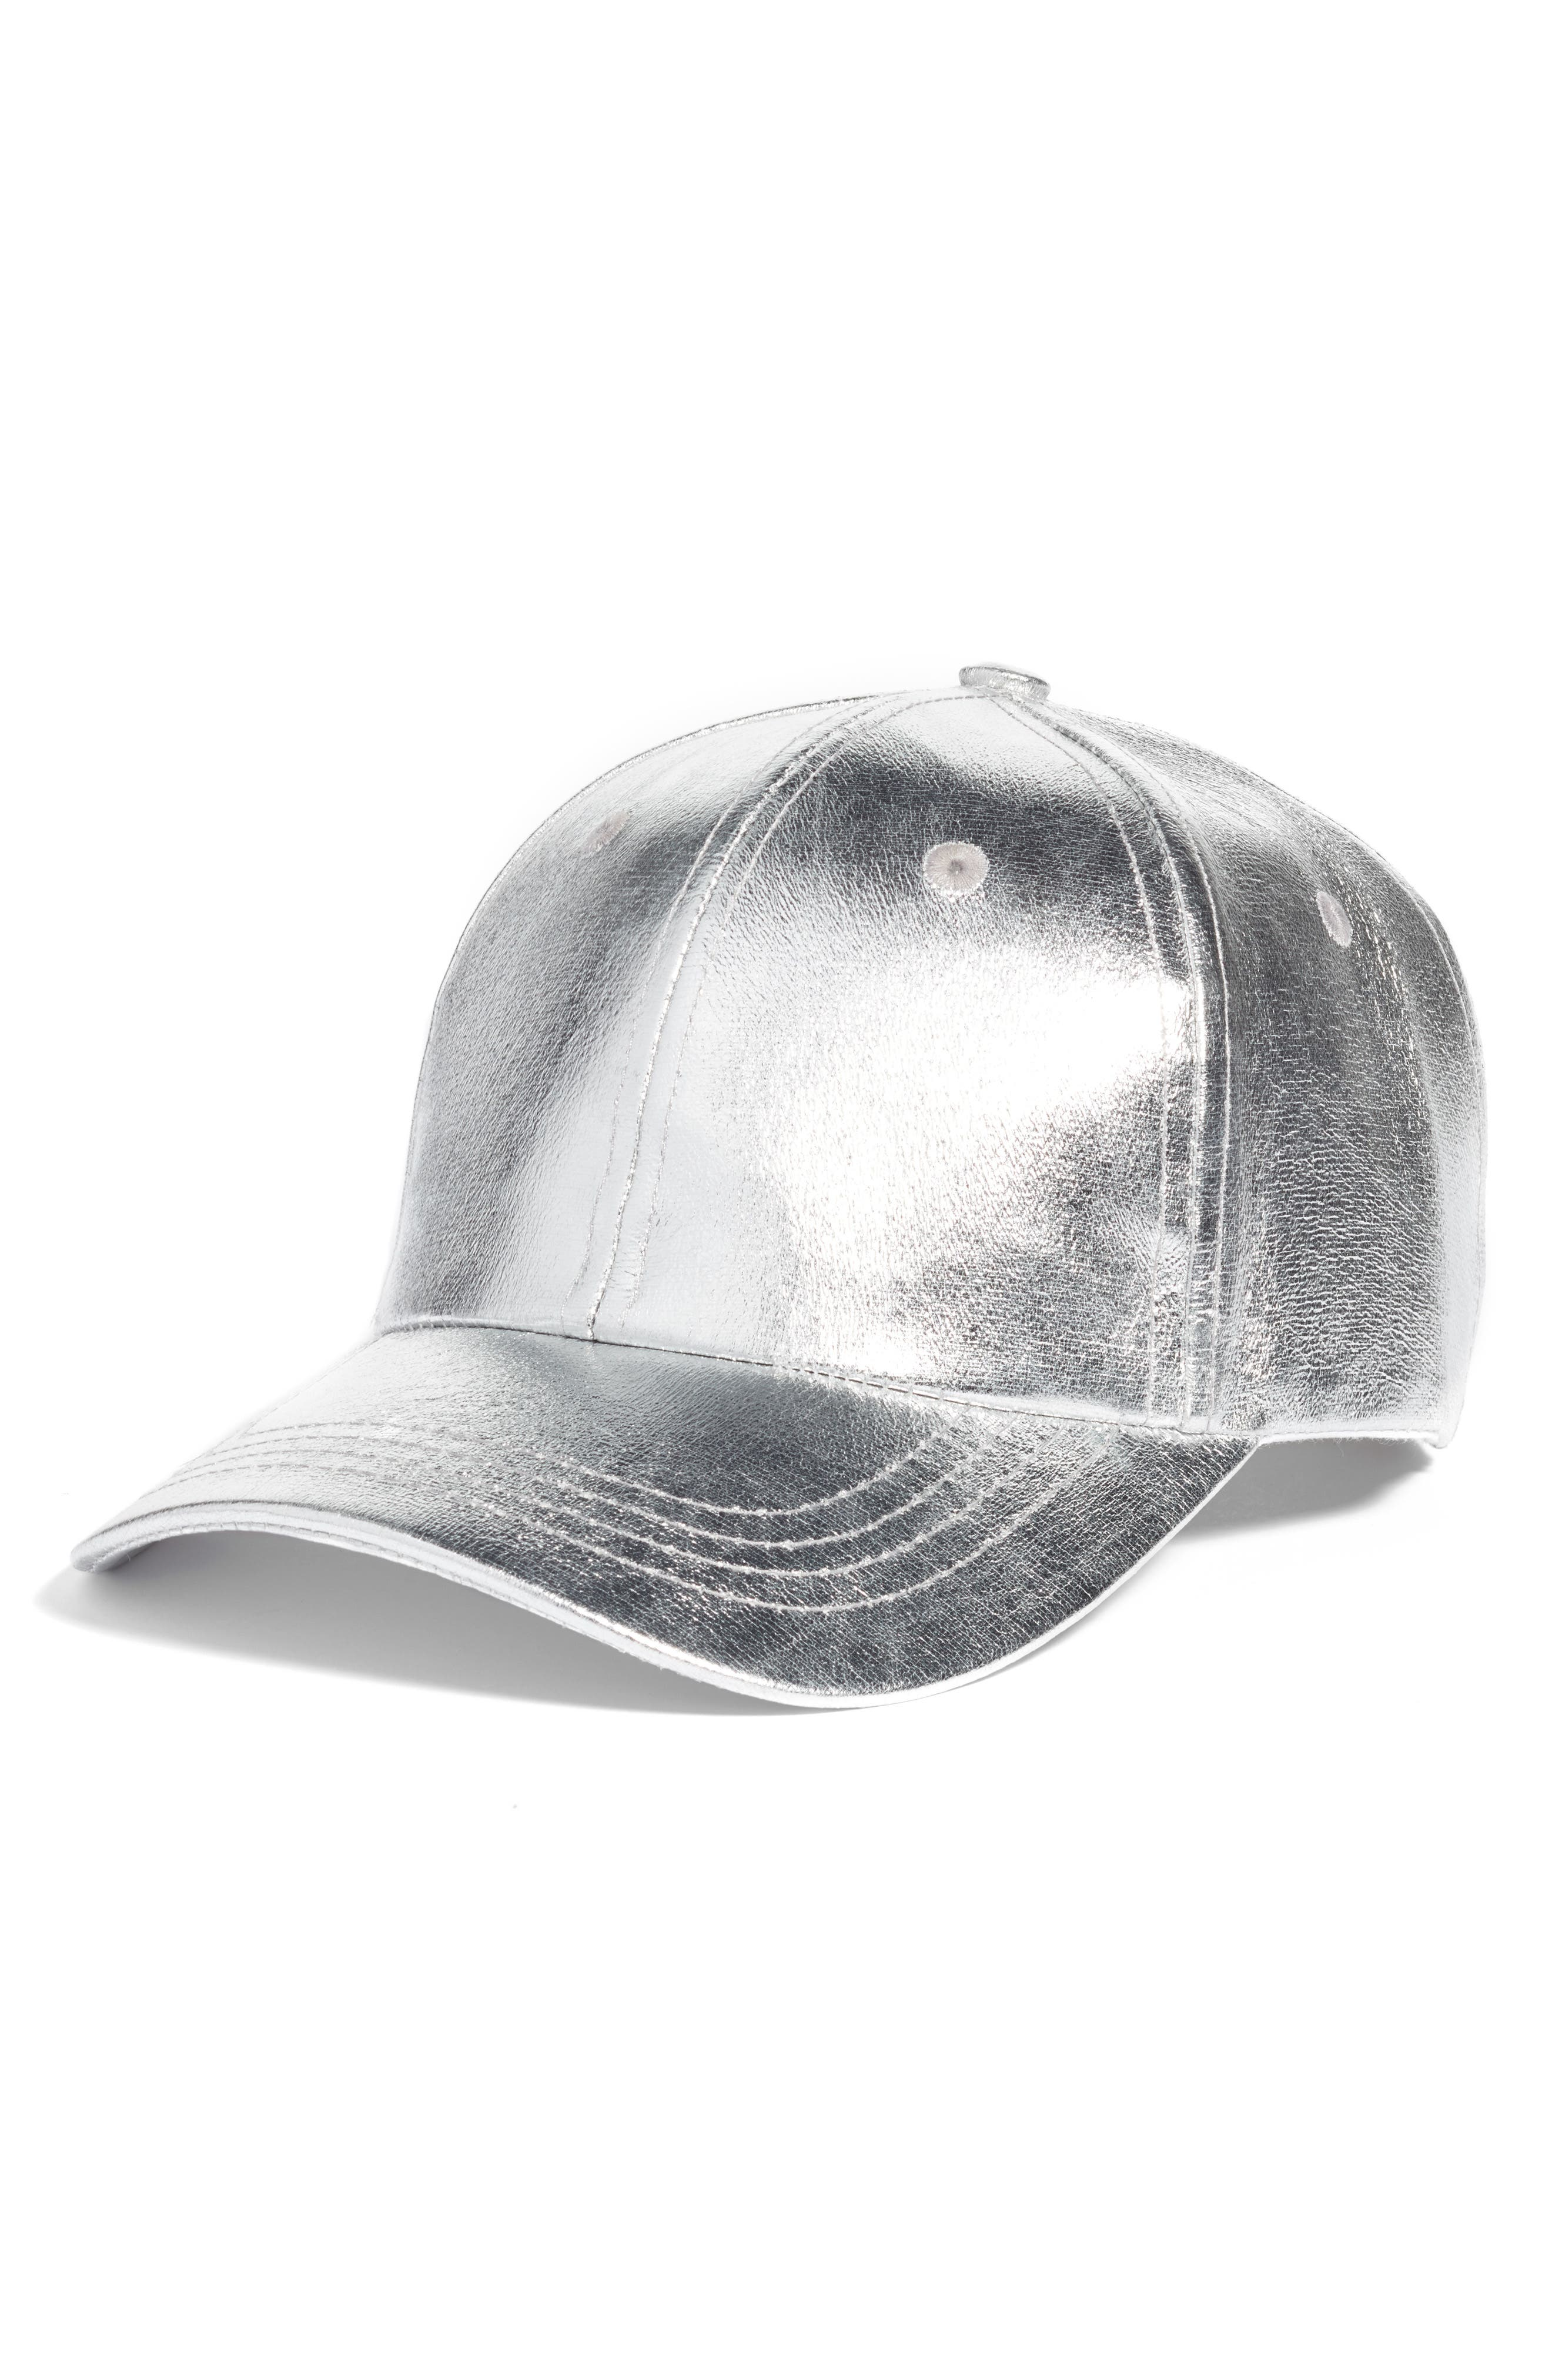 Collection XIIX Crackled Metallic Baseball Cap